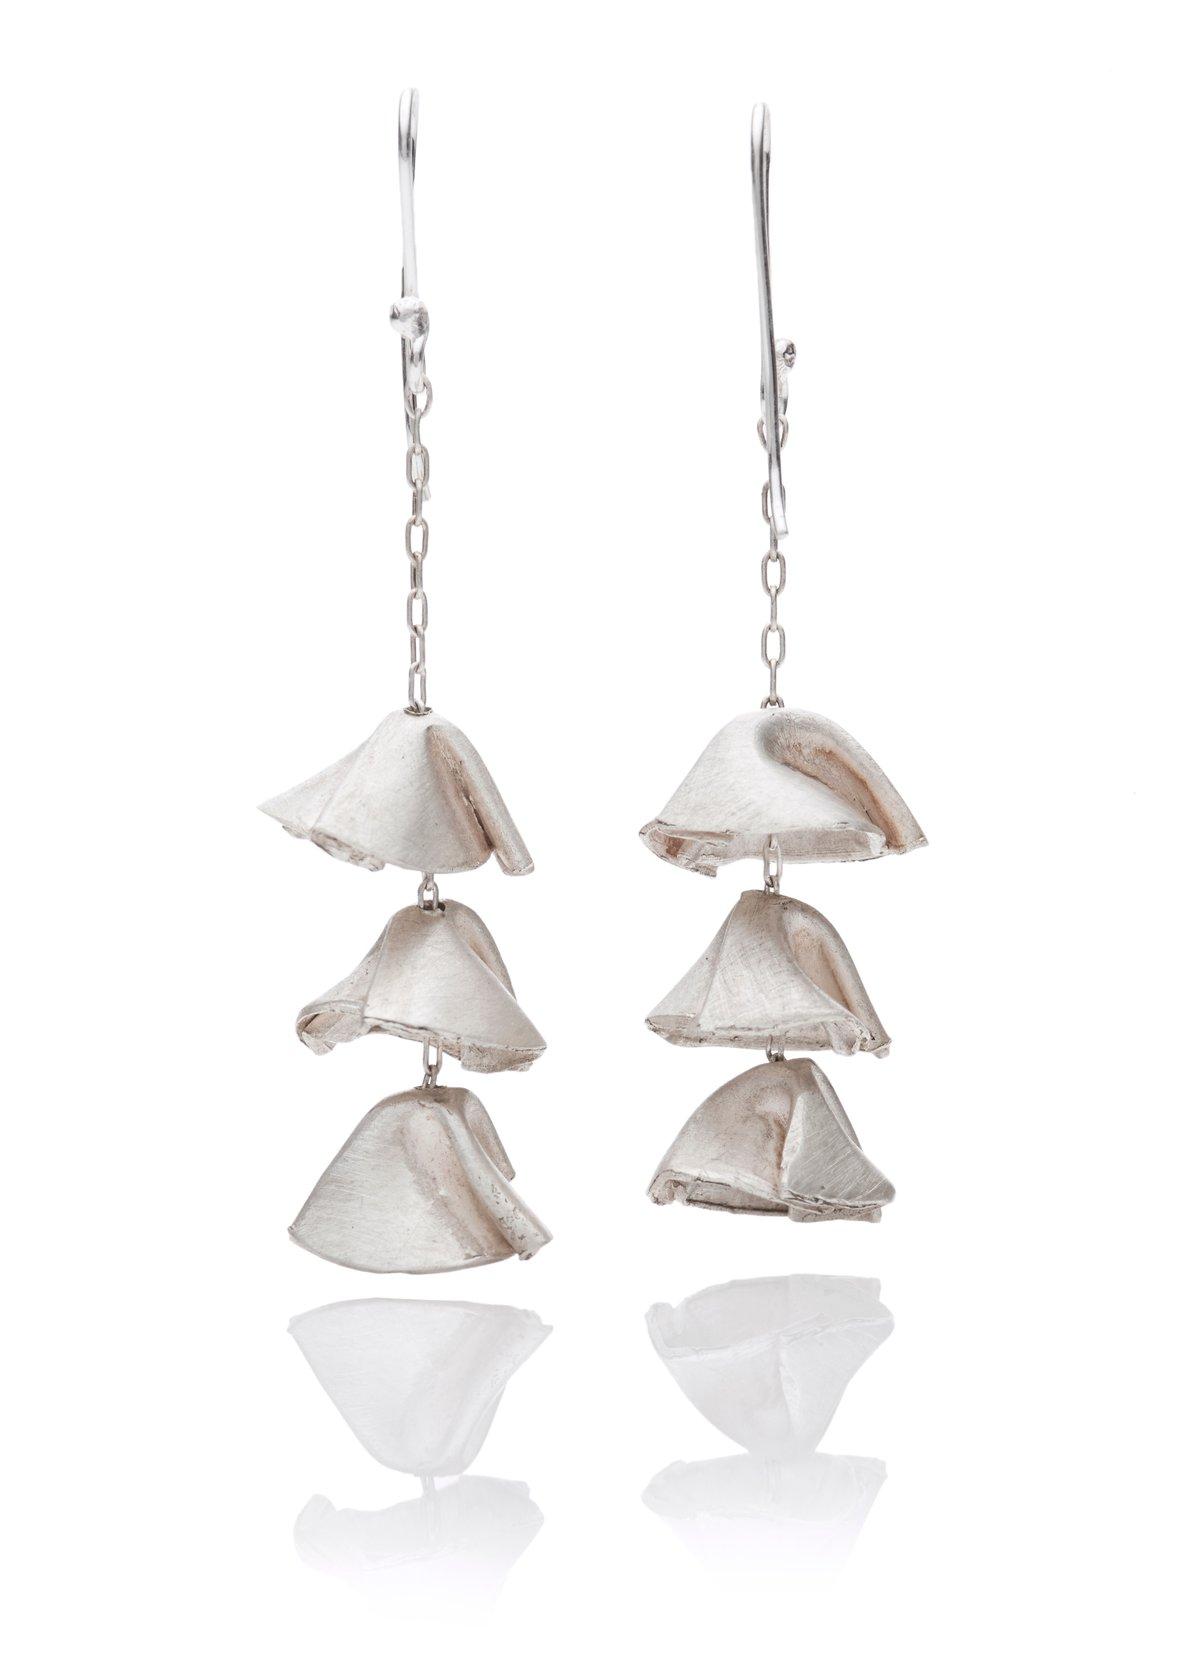 Hanging folded cups silver earrings